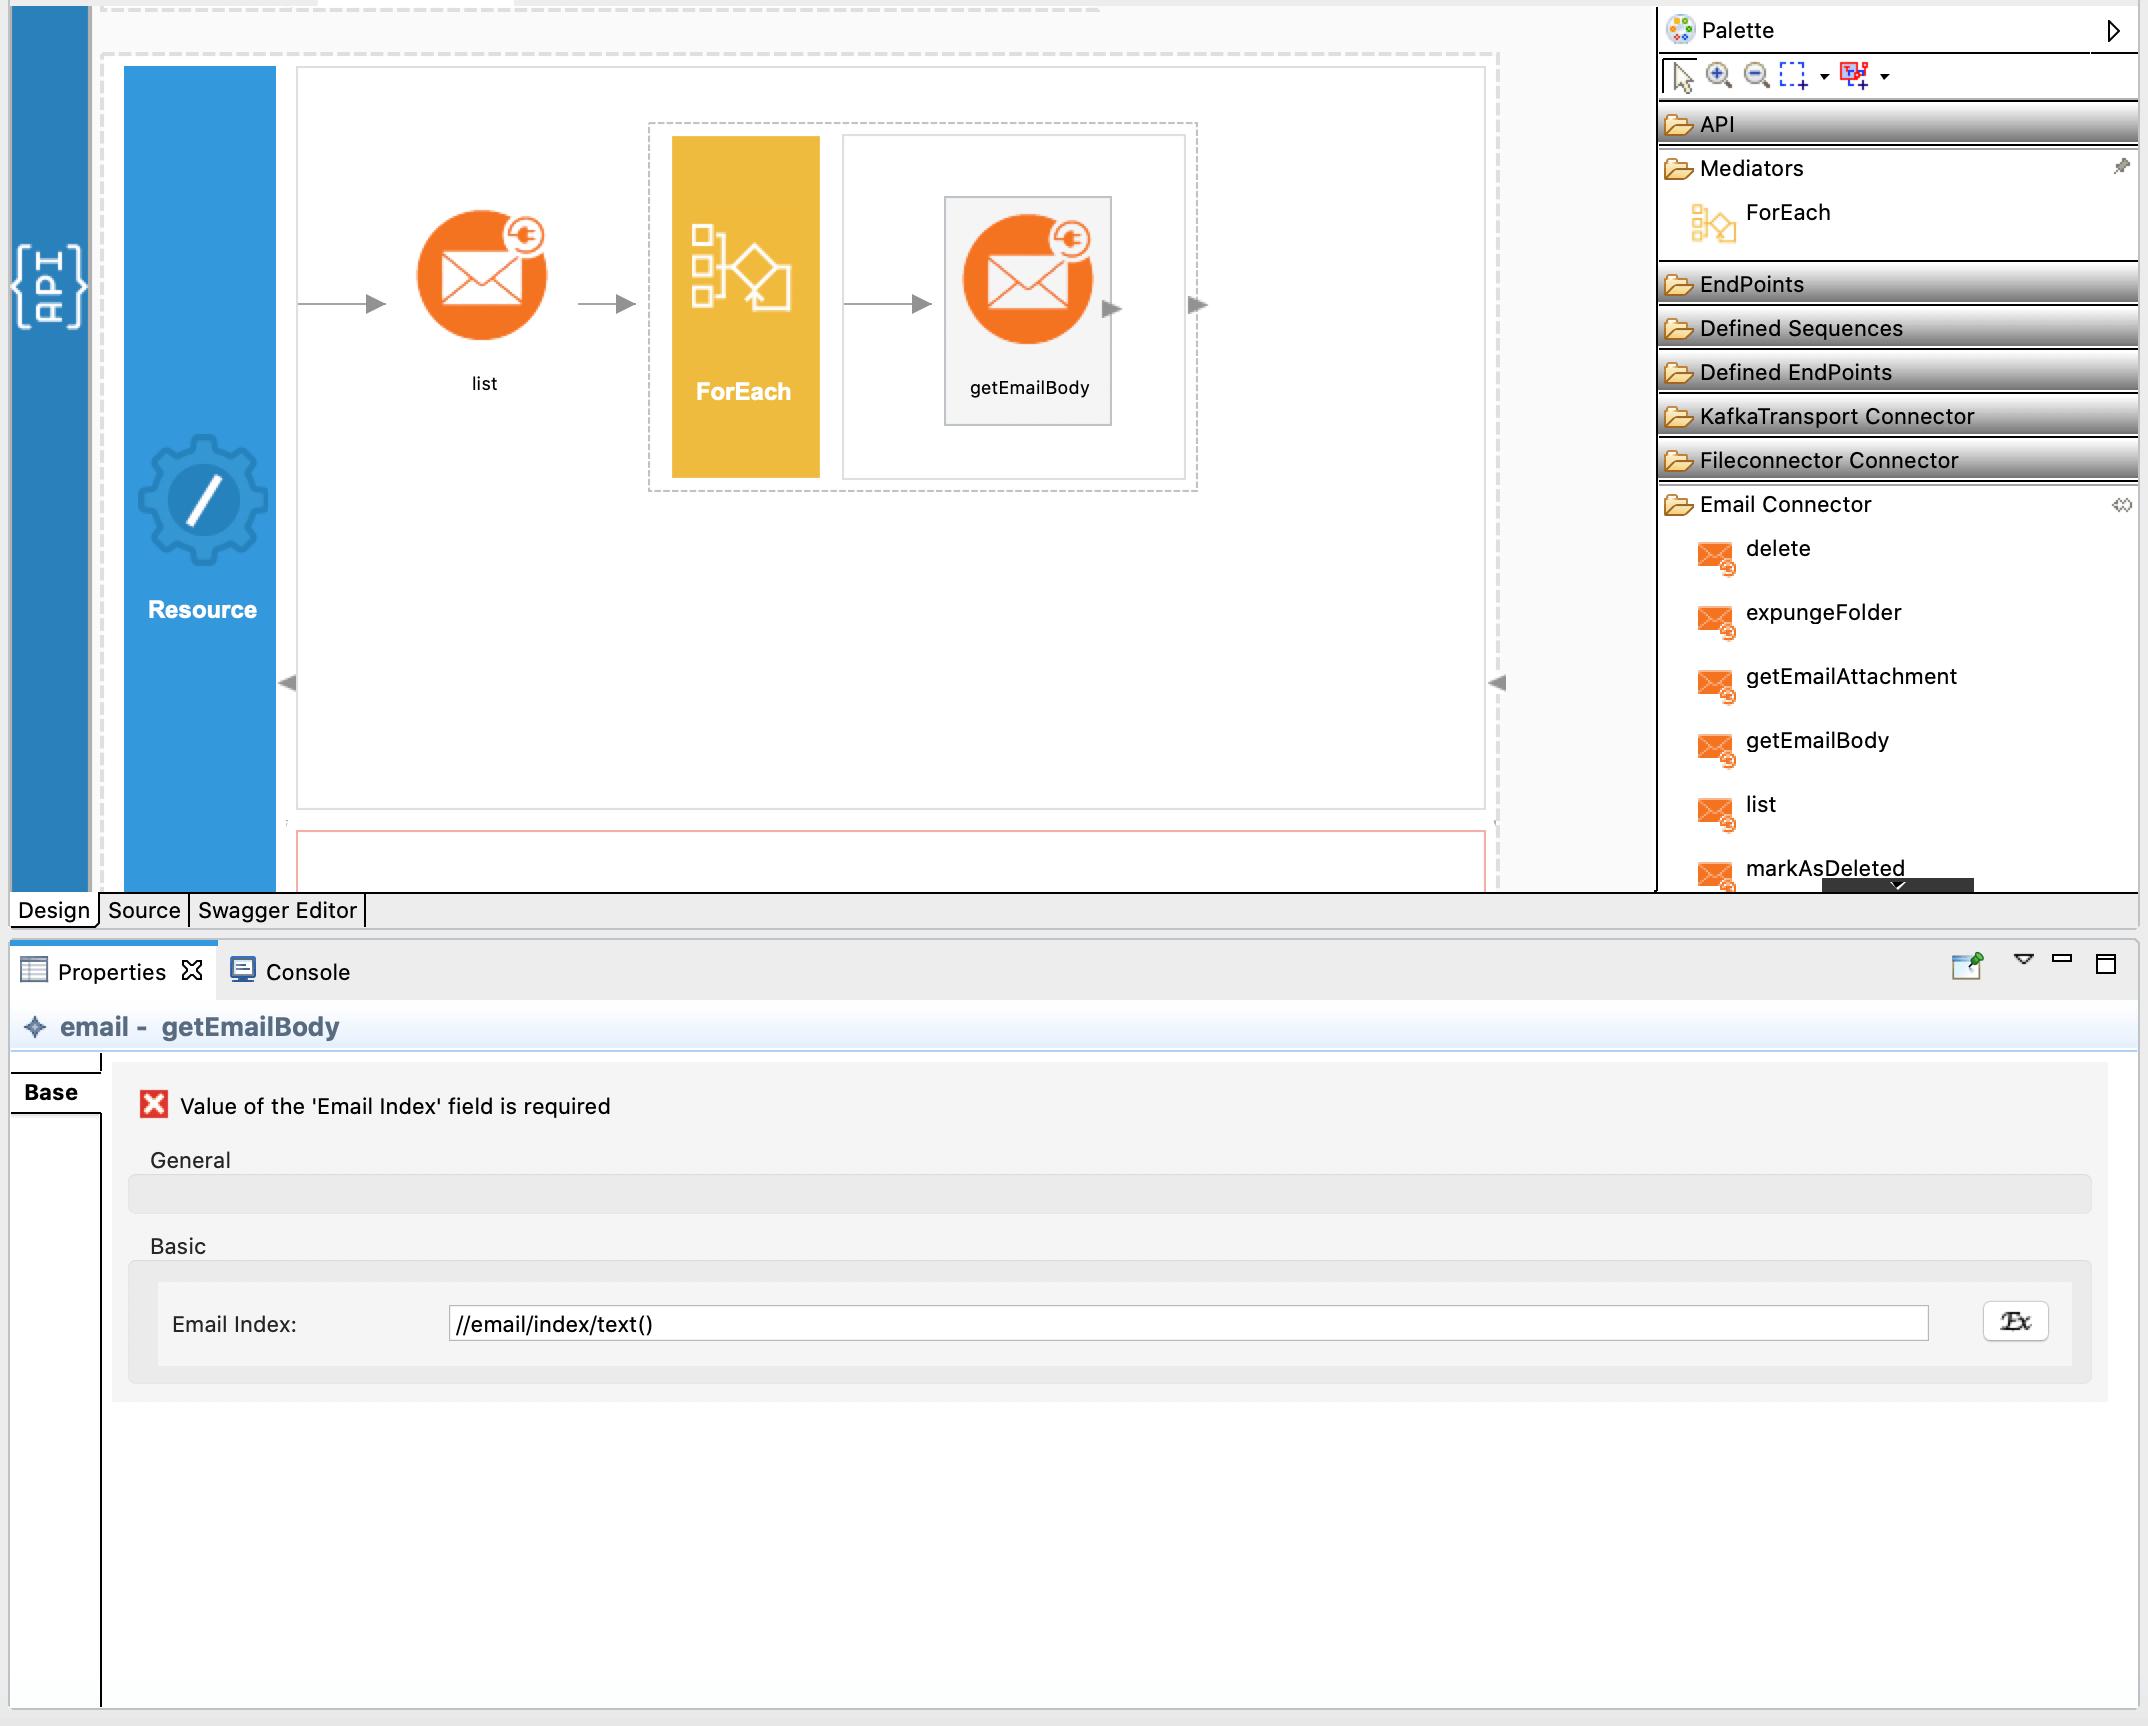 Adding getEmailBody operation.